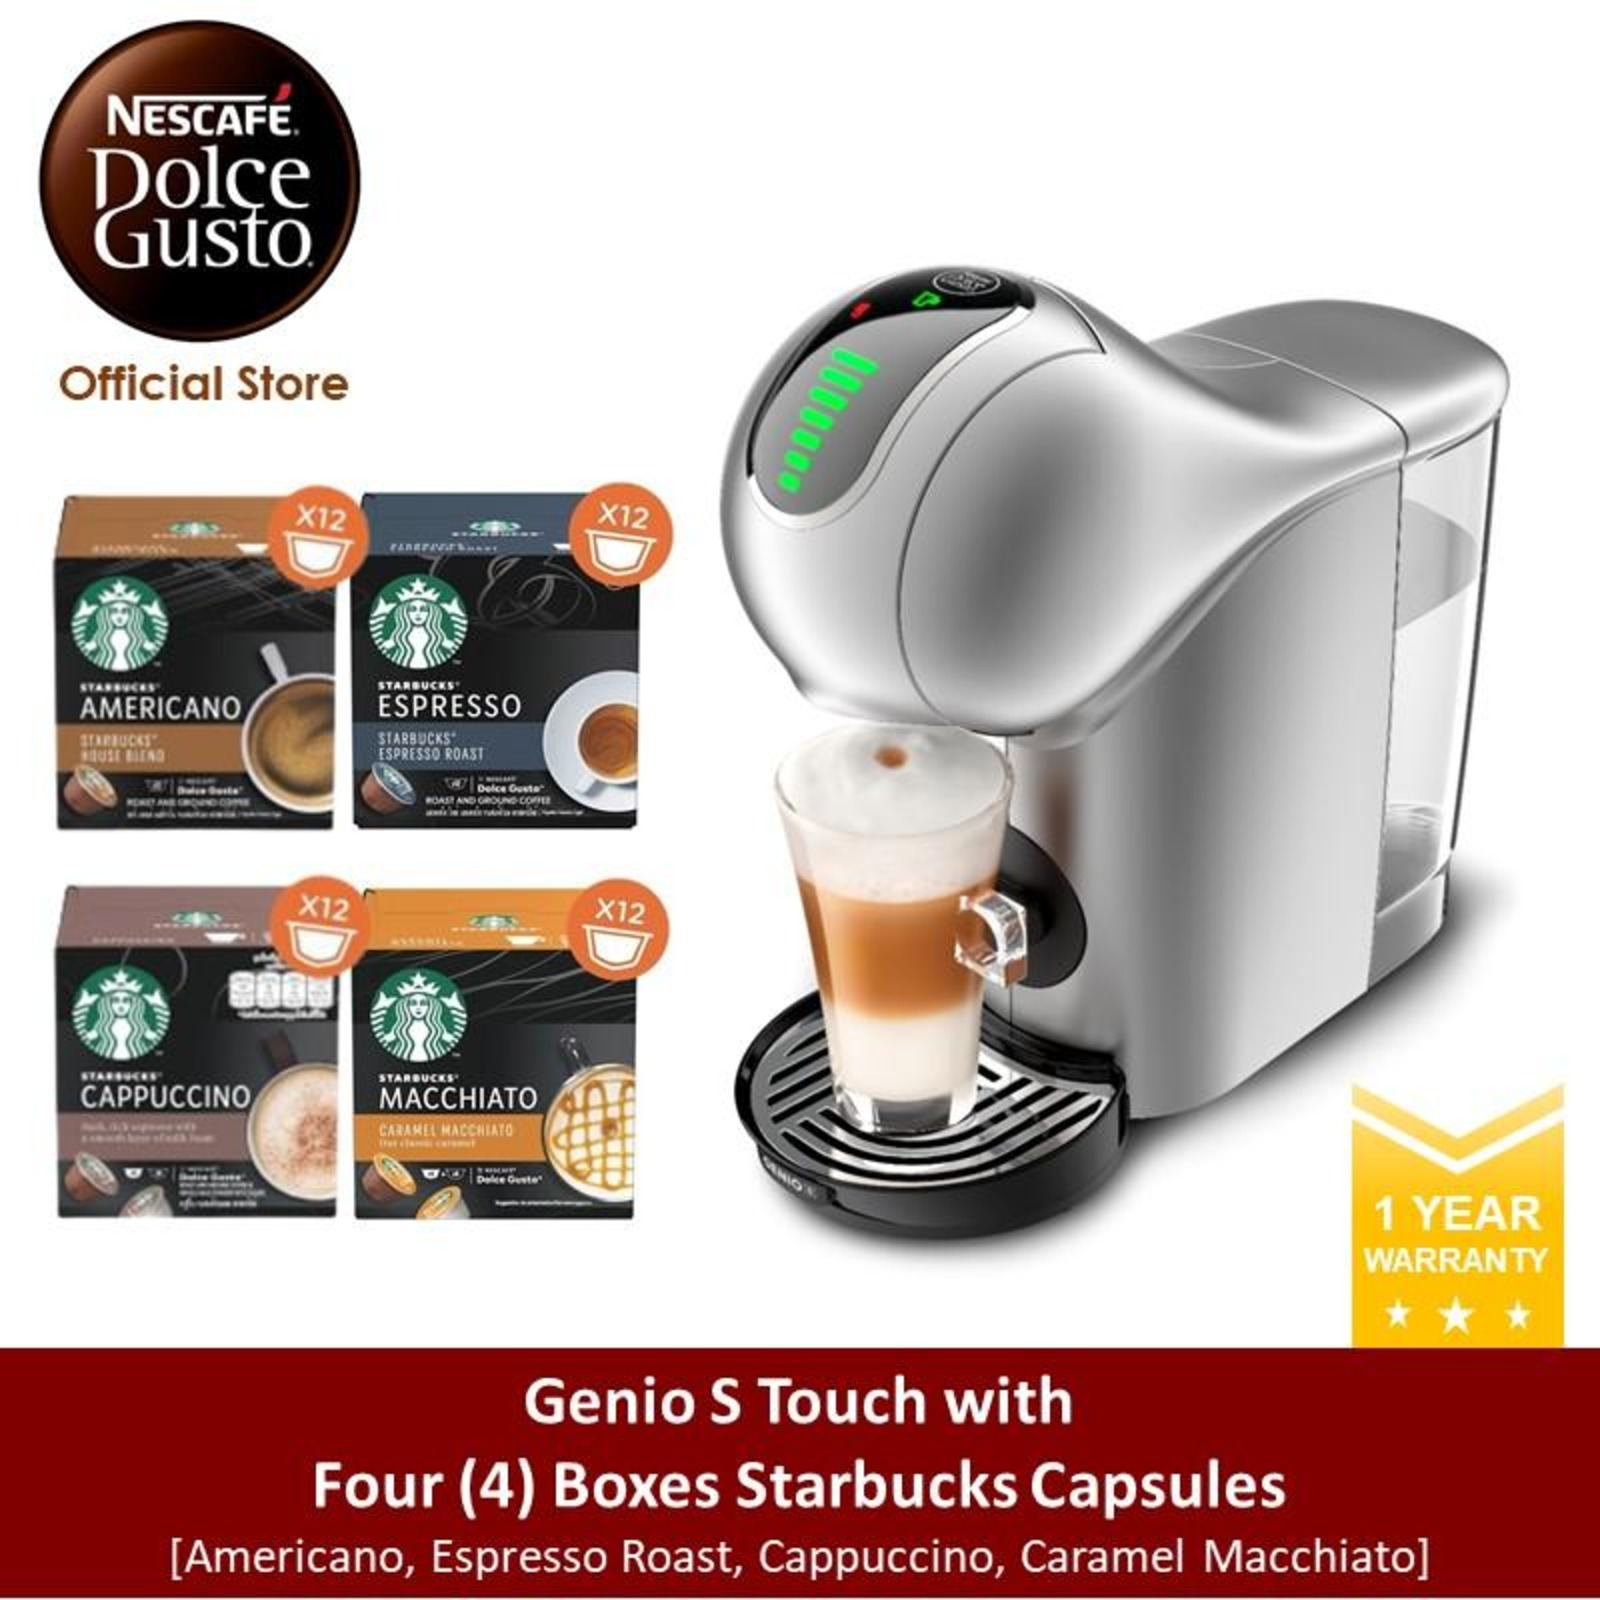 NESCAFE Dolce Gusto *GWP* Genio S Touch w 4 Starbucks Capsule